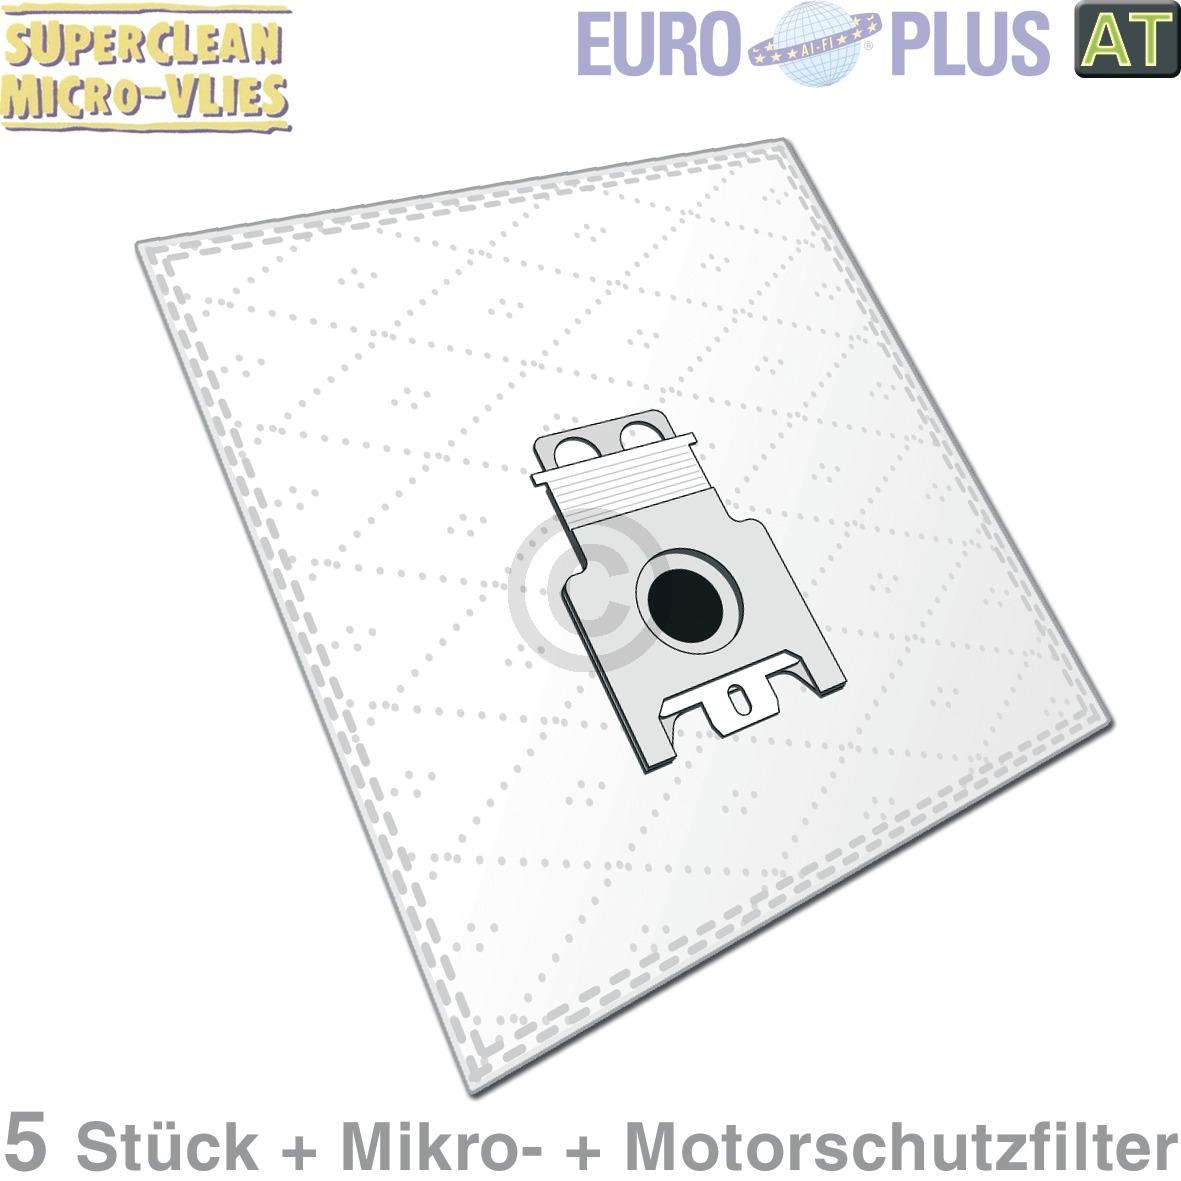 Filterbeutel Europlus M309mV, AT! Miele, AEG, Electrolux, Juno, Zanussi, für Mel